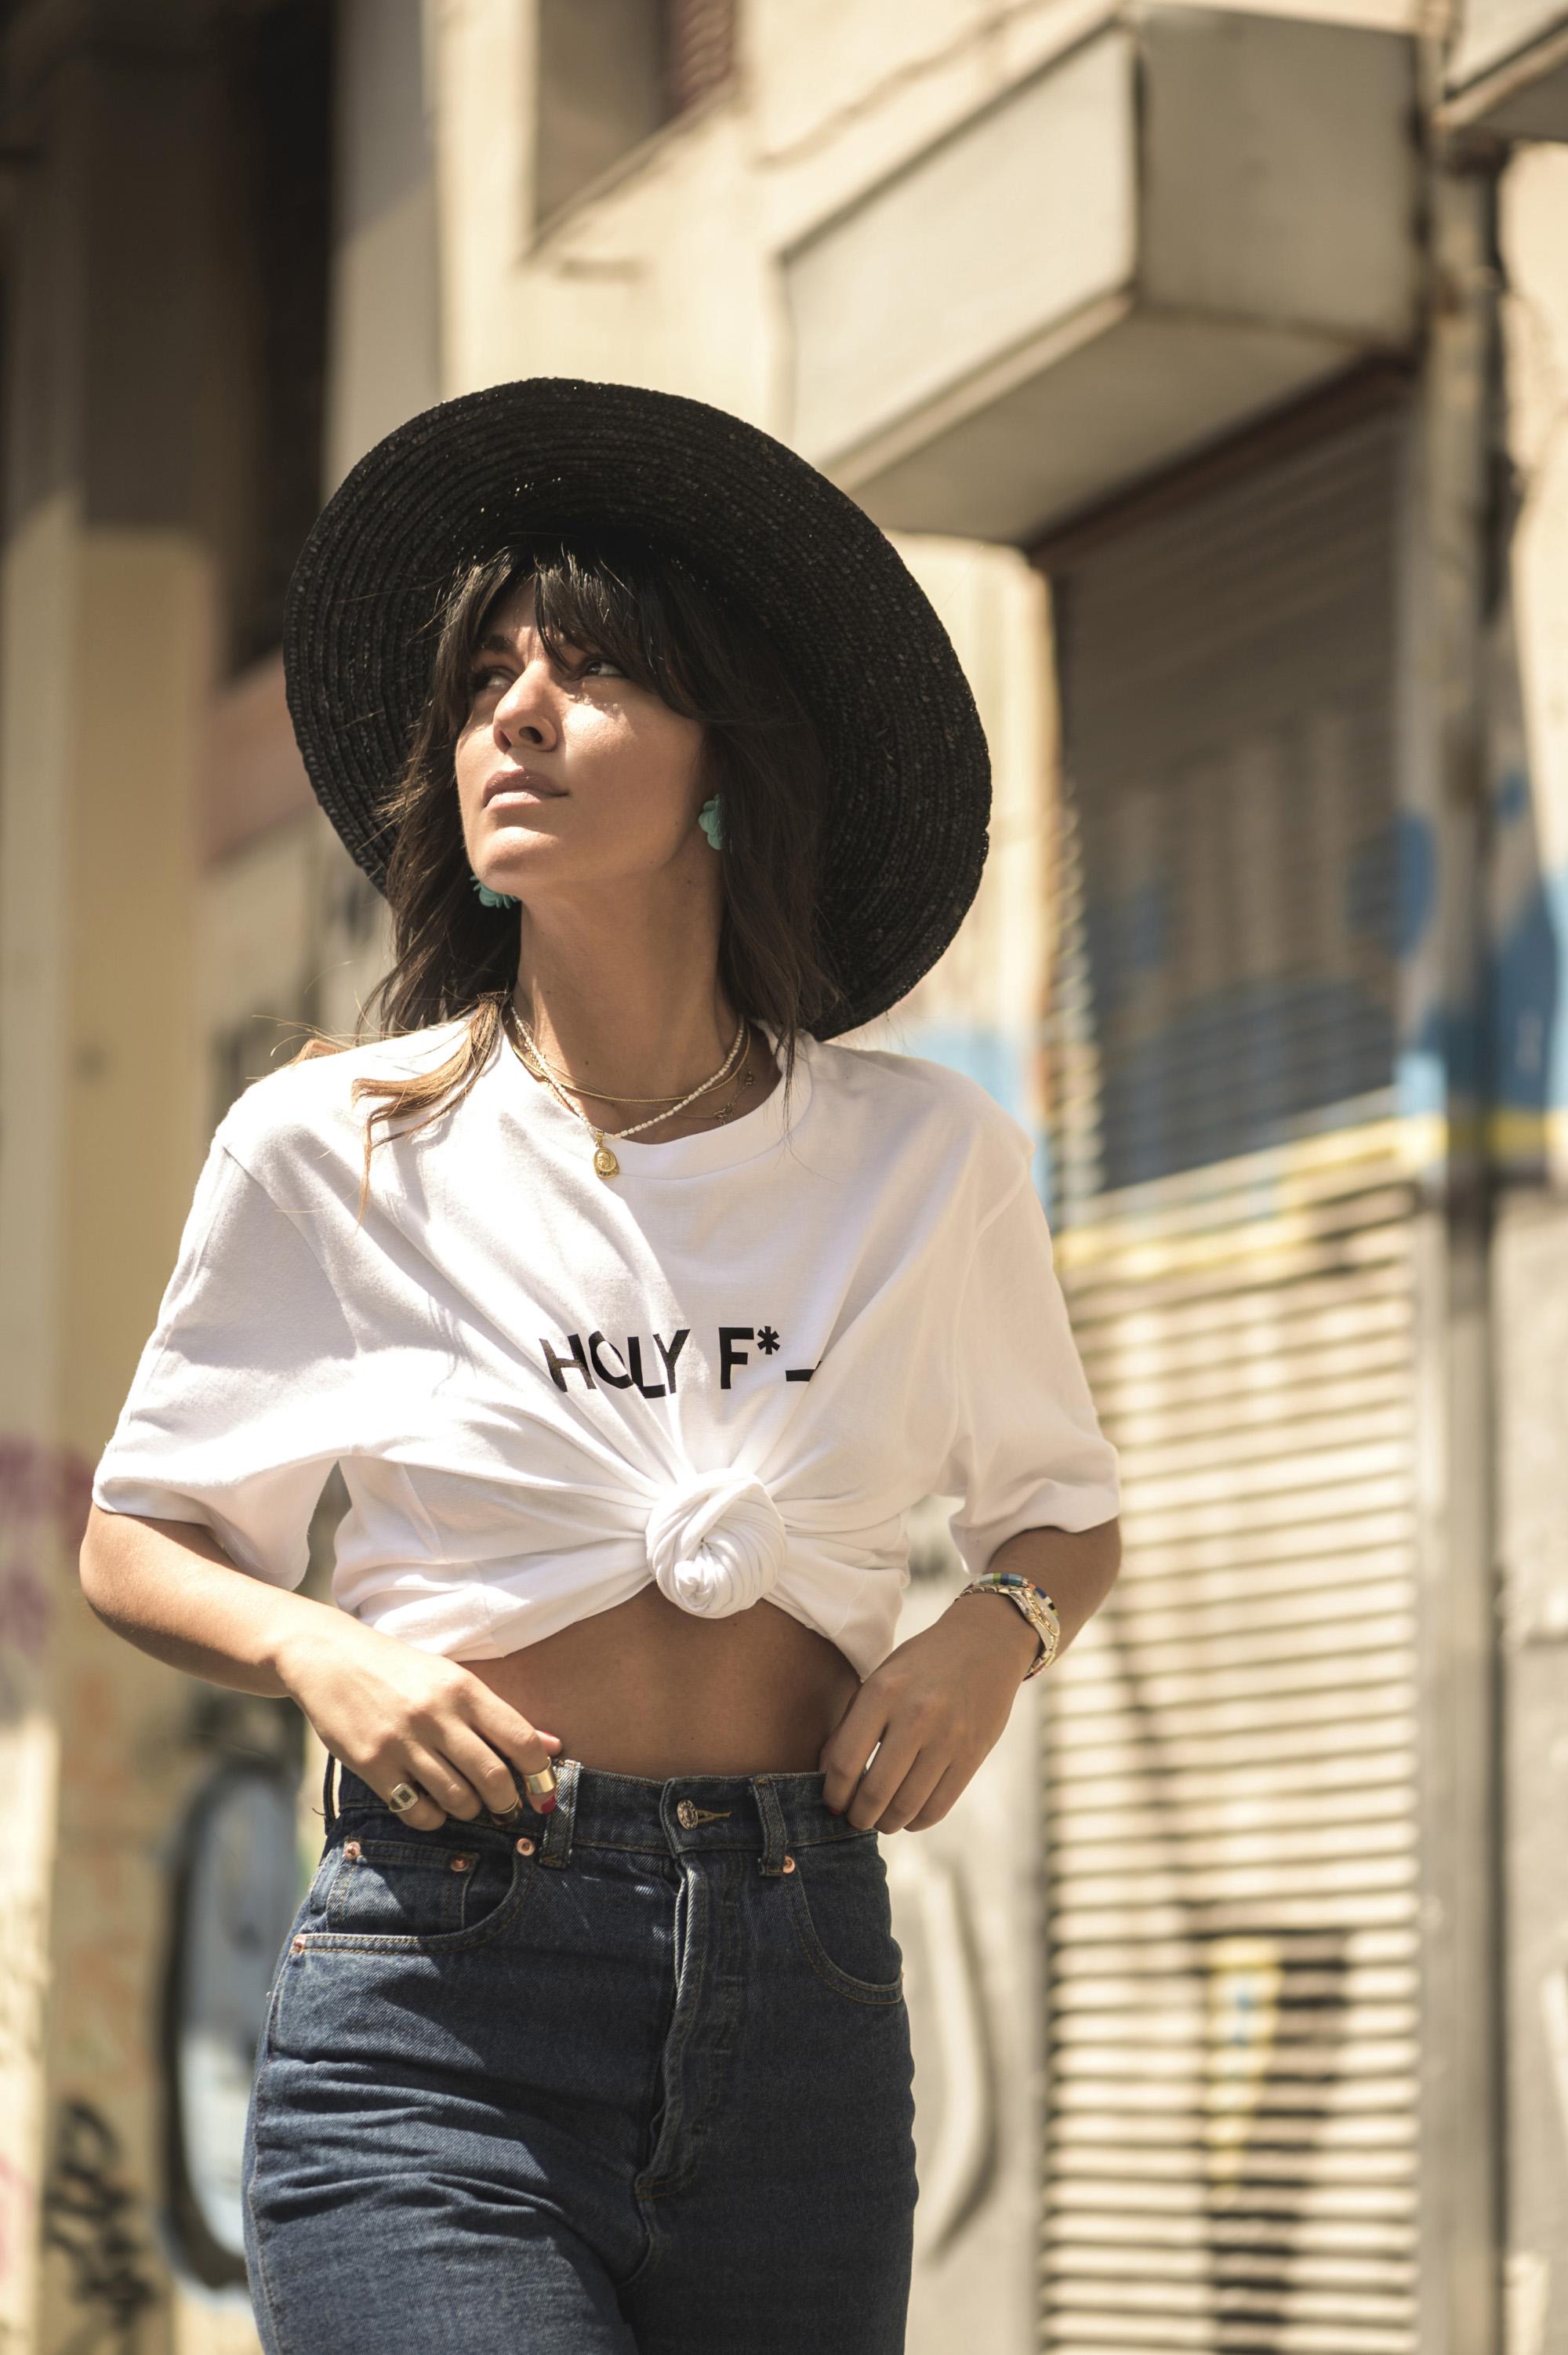 Tι κοινό έχει η Anna Wintour με τη θεά Kali; Ένα νέο brand με T-Shirts!